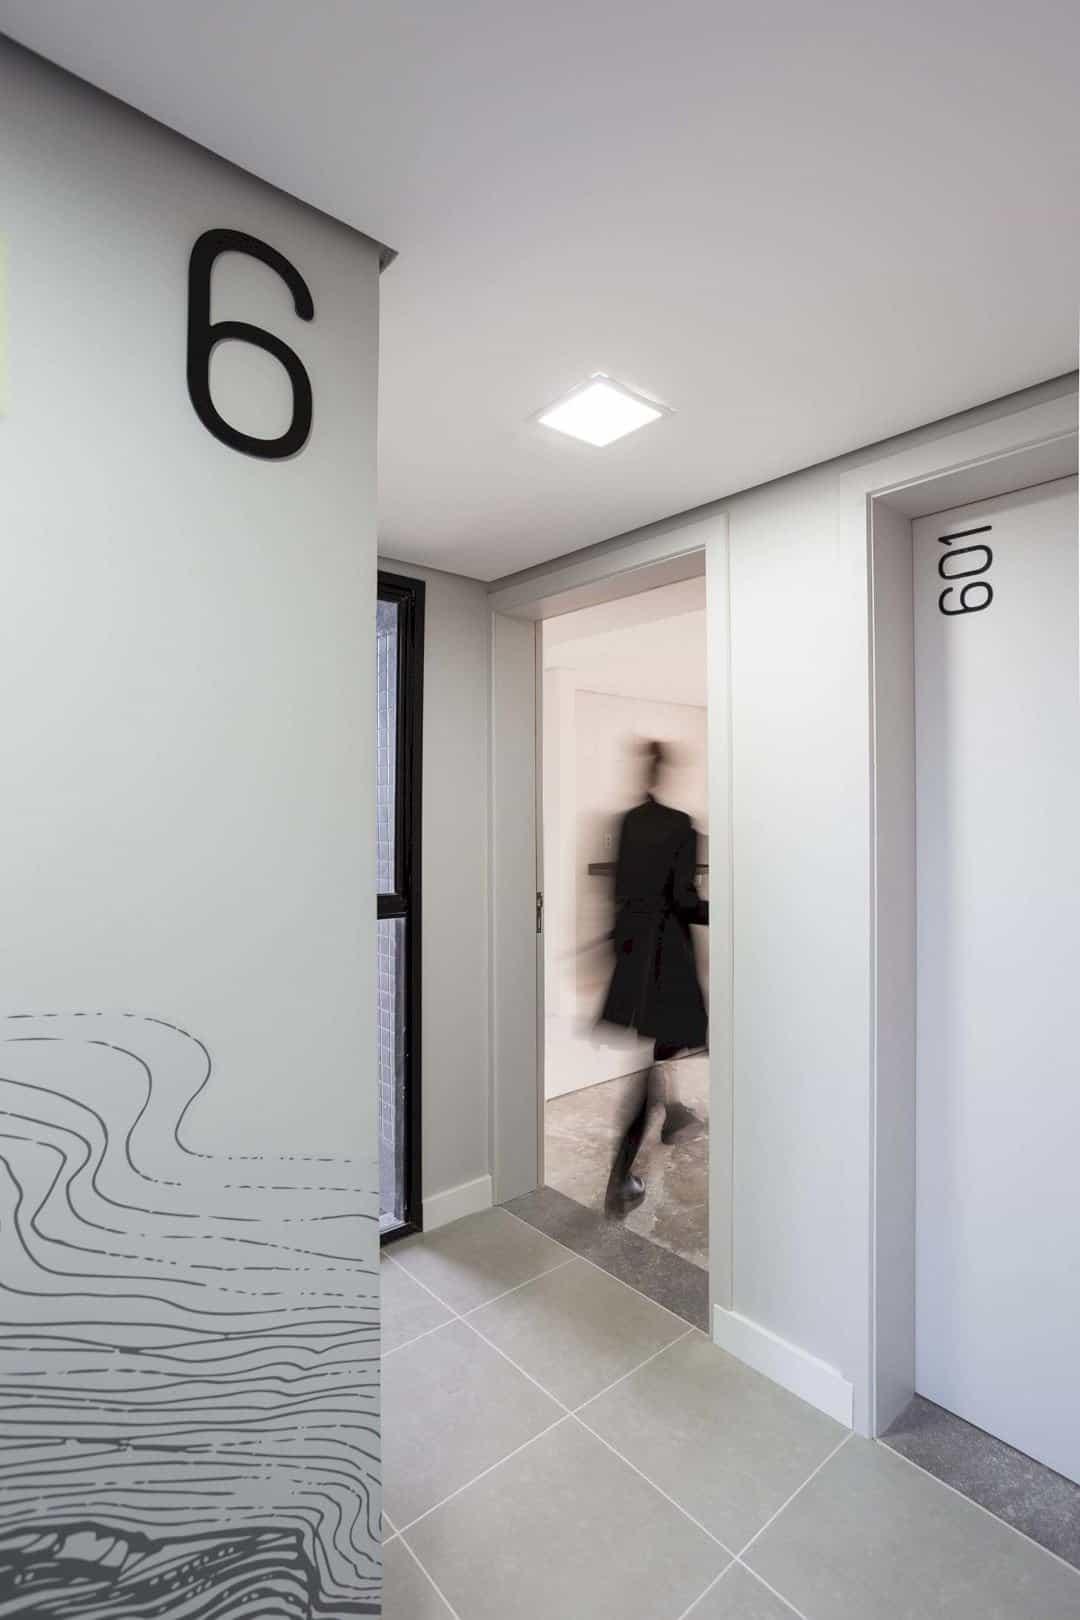 Fernando Abbott 866 A High Rise Residential Building In Porto Alegre 6